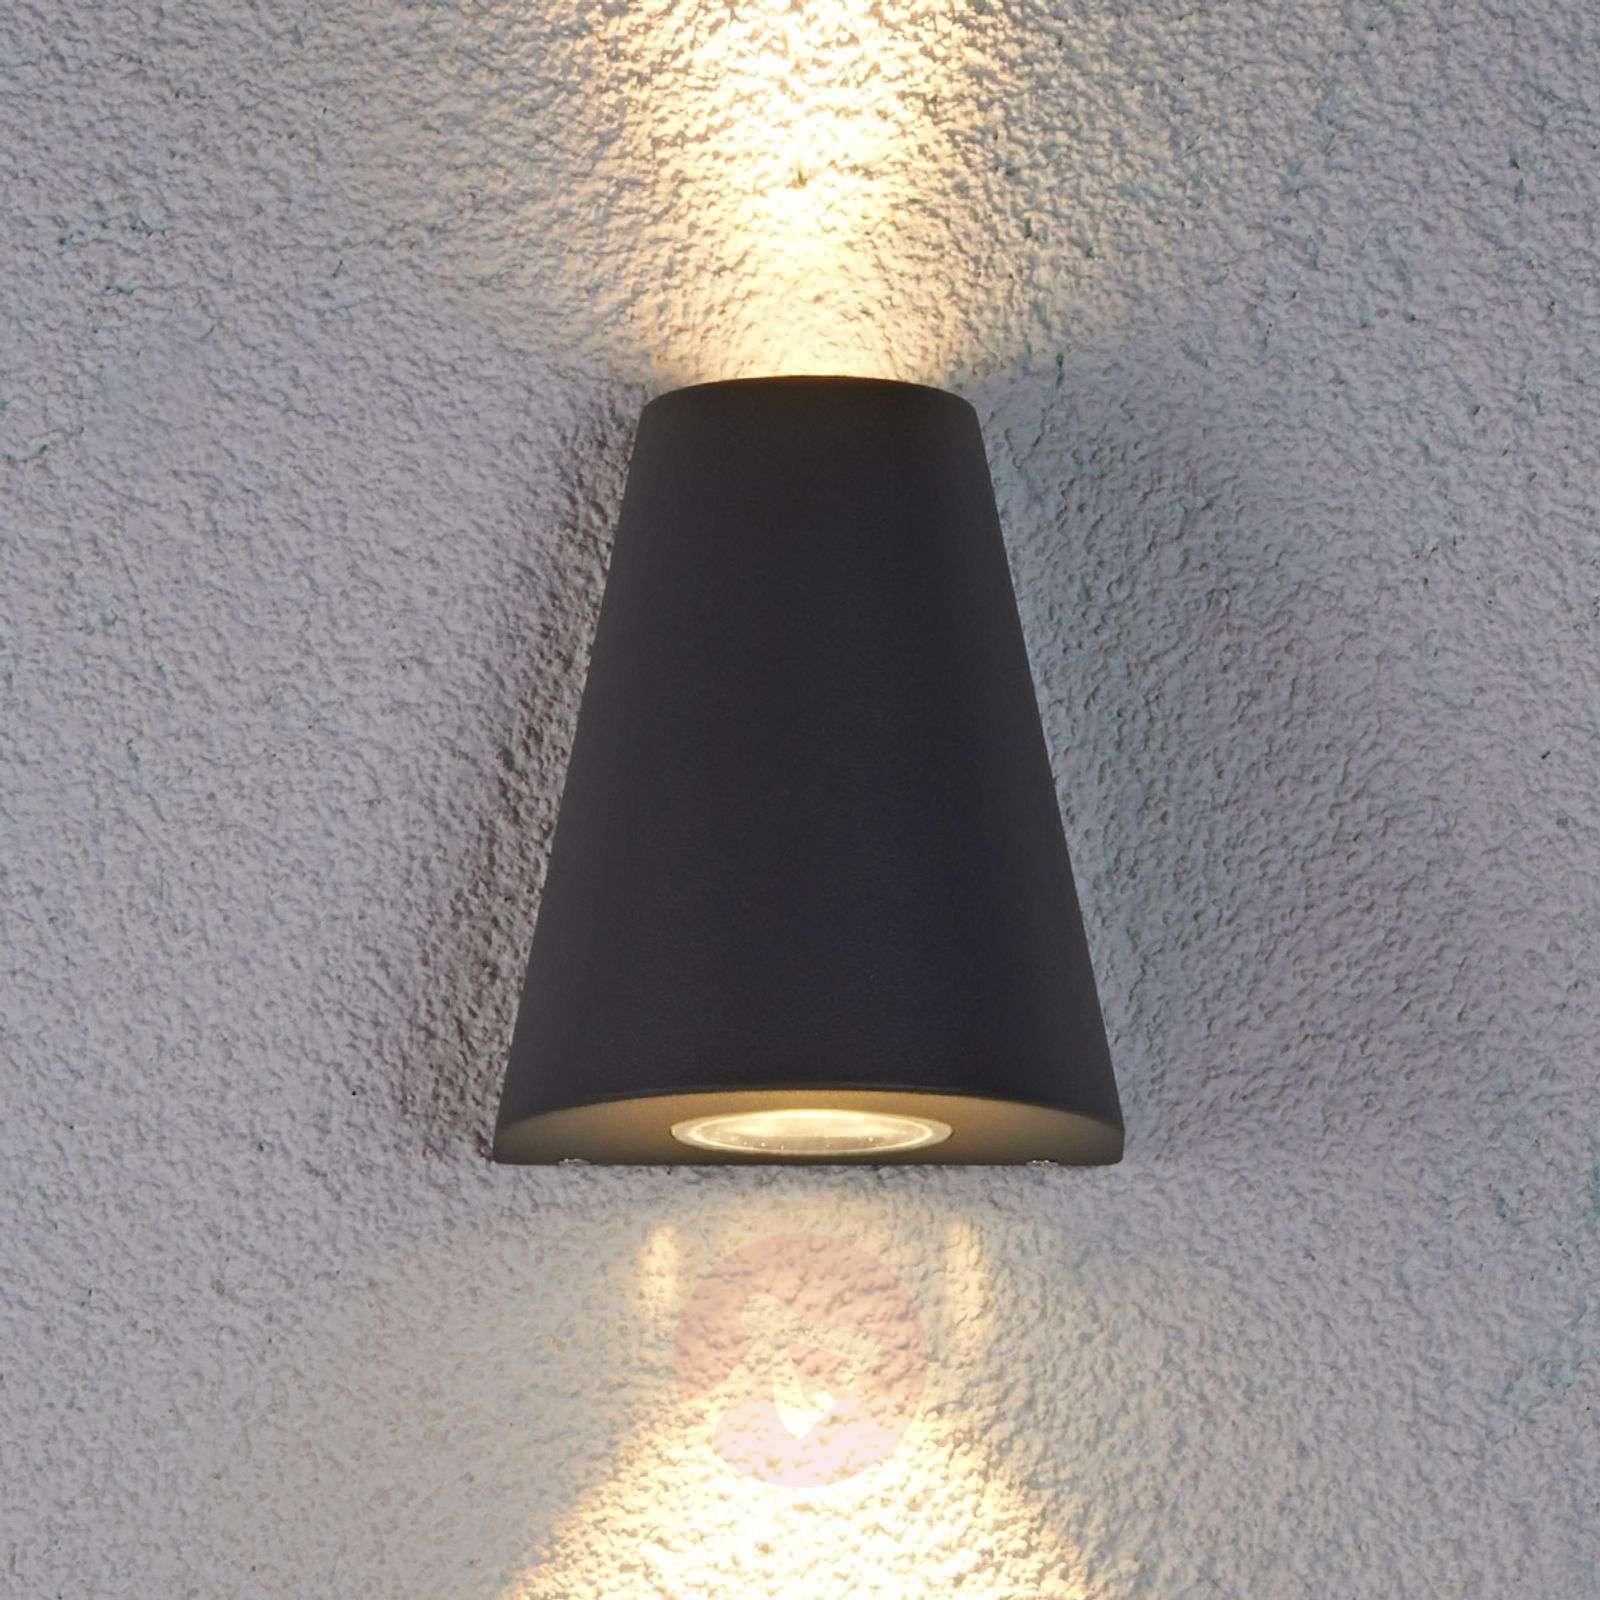 room outdoor astounding design light for small lighting dining improvement hardware solar table home lights ideas led